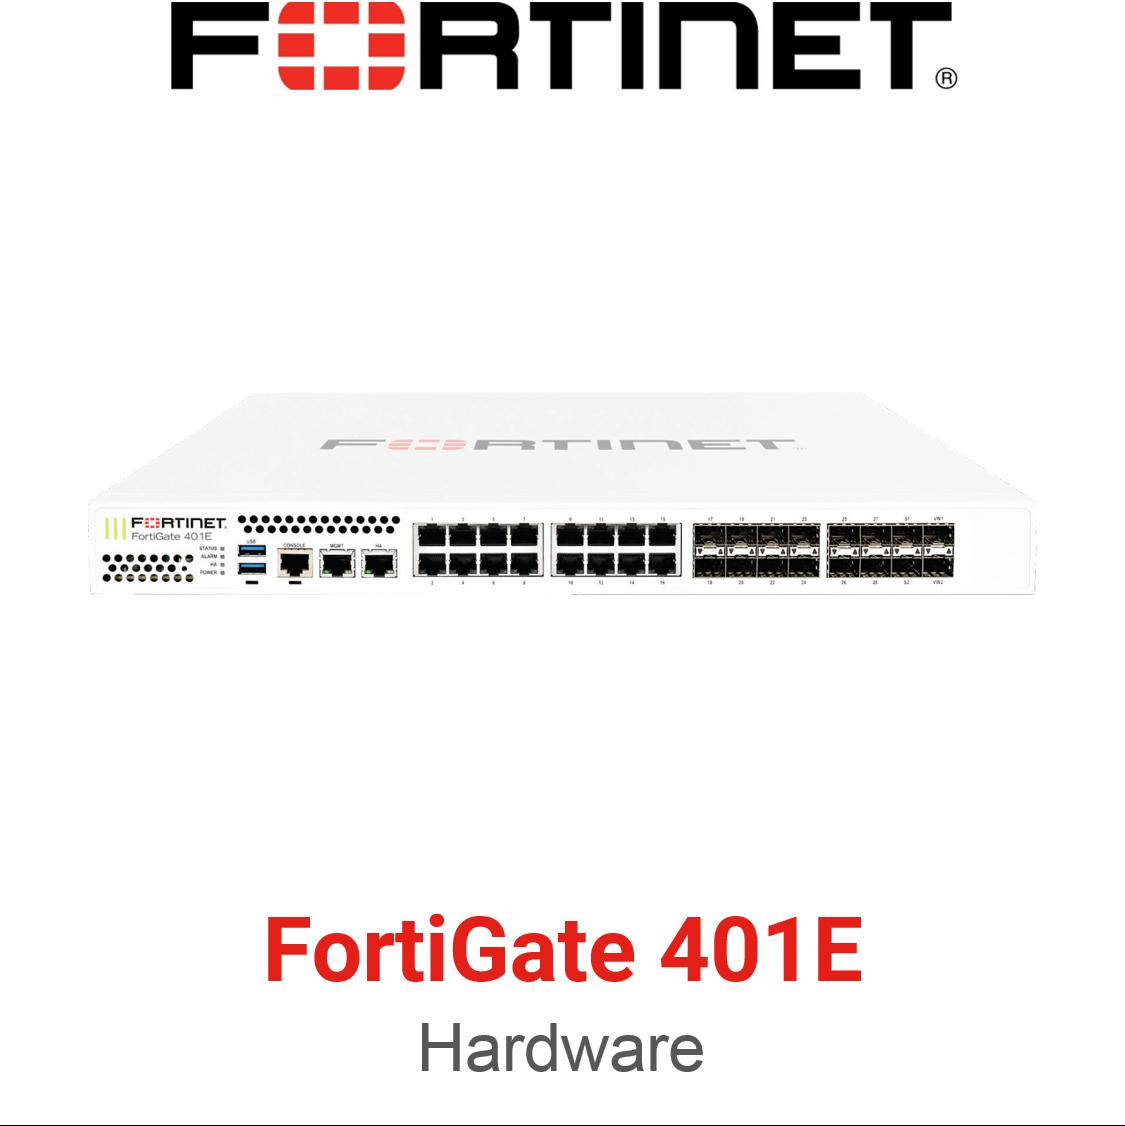 Fortinet FortiGate 401E Firewall